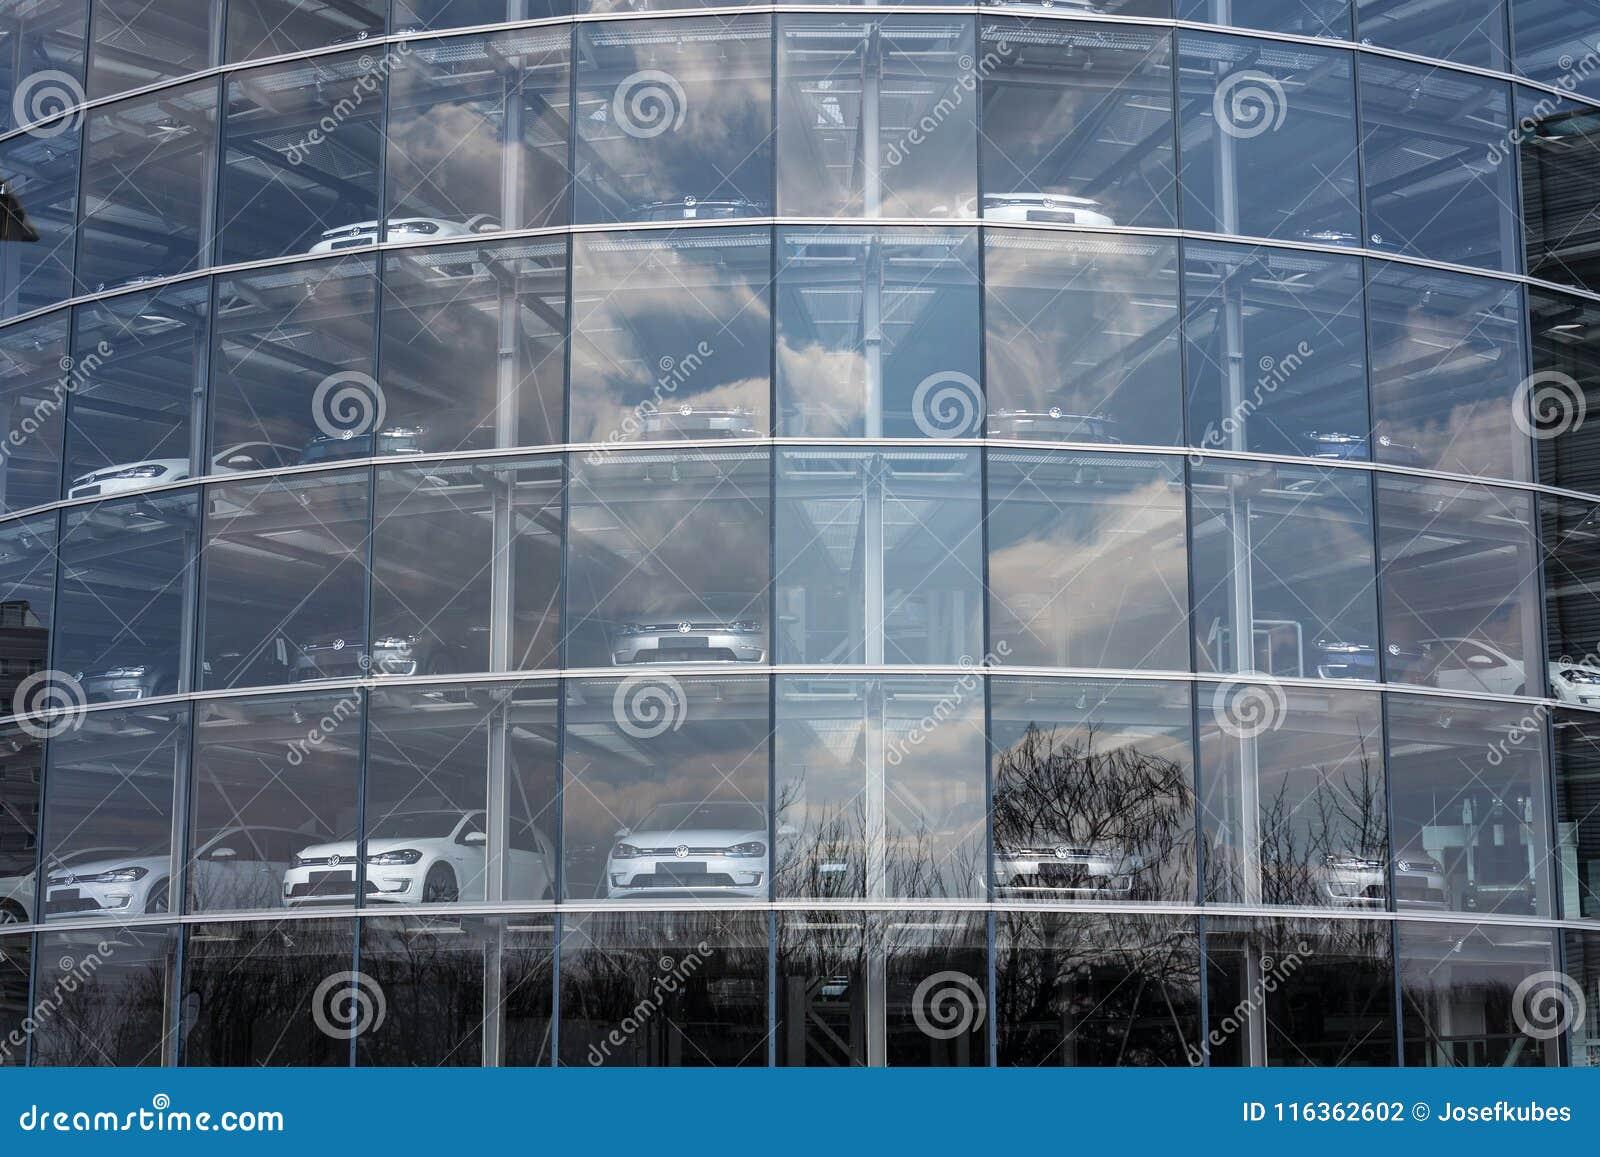 Inkopplingshybrid- Volkswagen e-golf elbilar står bak exponeringsglas i Glasernen Manufaktur - den genomskinliga fabriken, Dresde